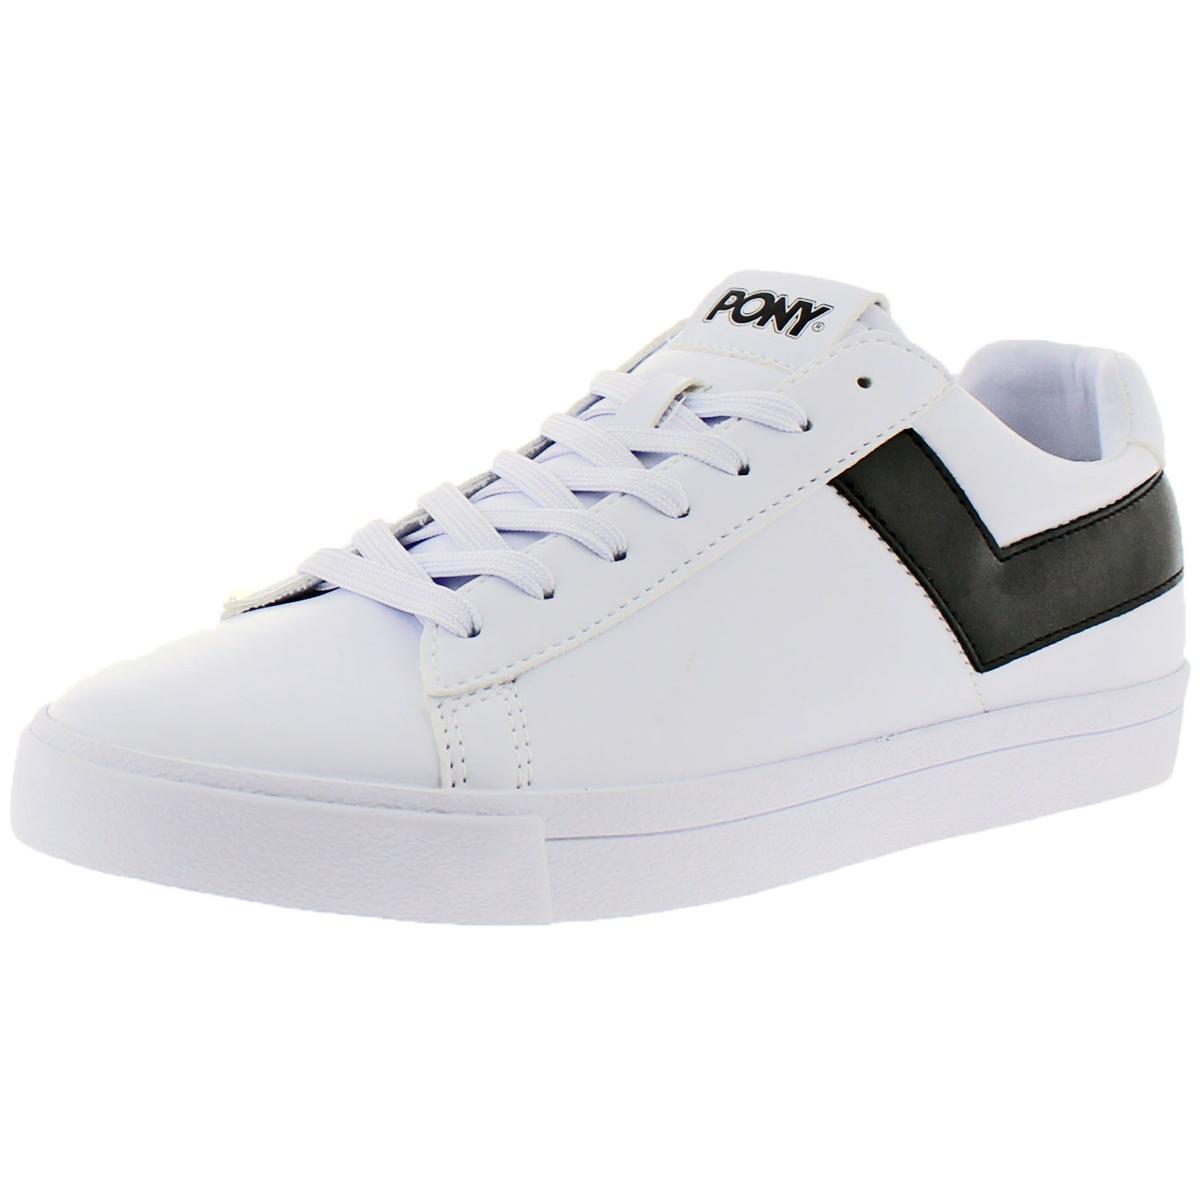 abbe7800de8 ... Pony Top Star Men s Retro Fashion Fashion Fashion Court Sneakers Shoes  01e070 ...